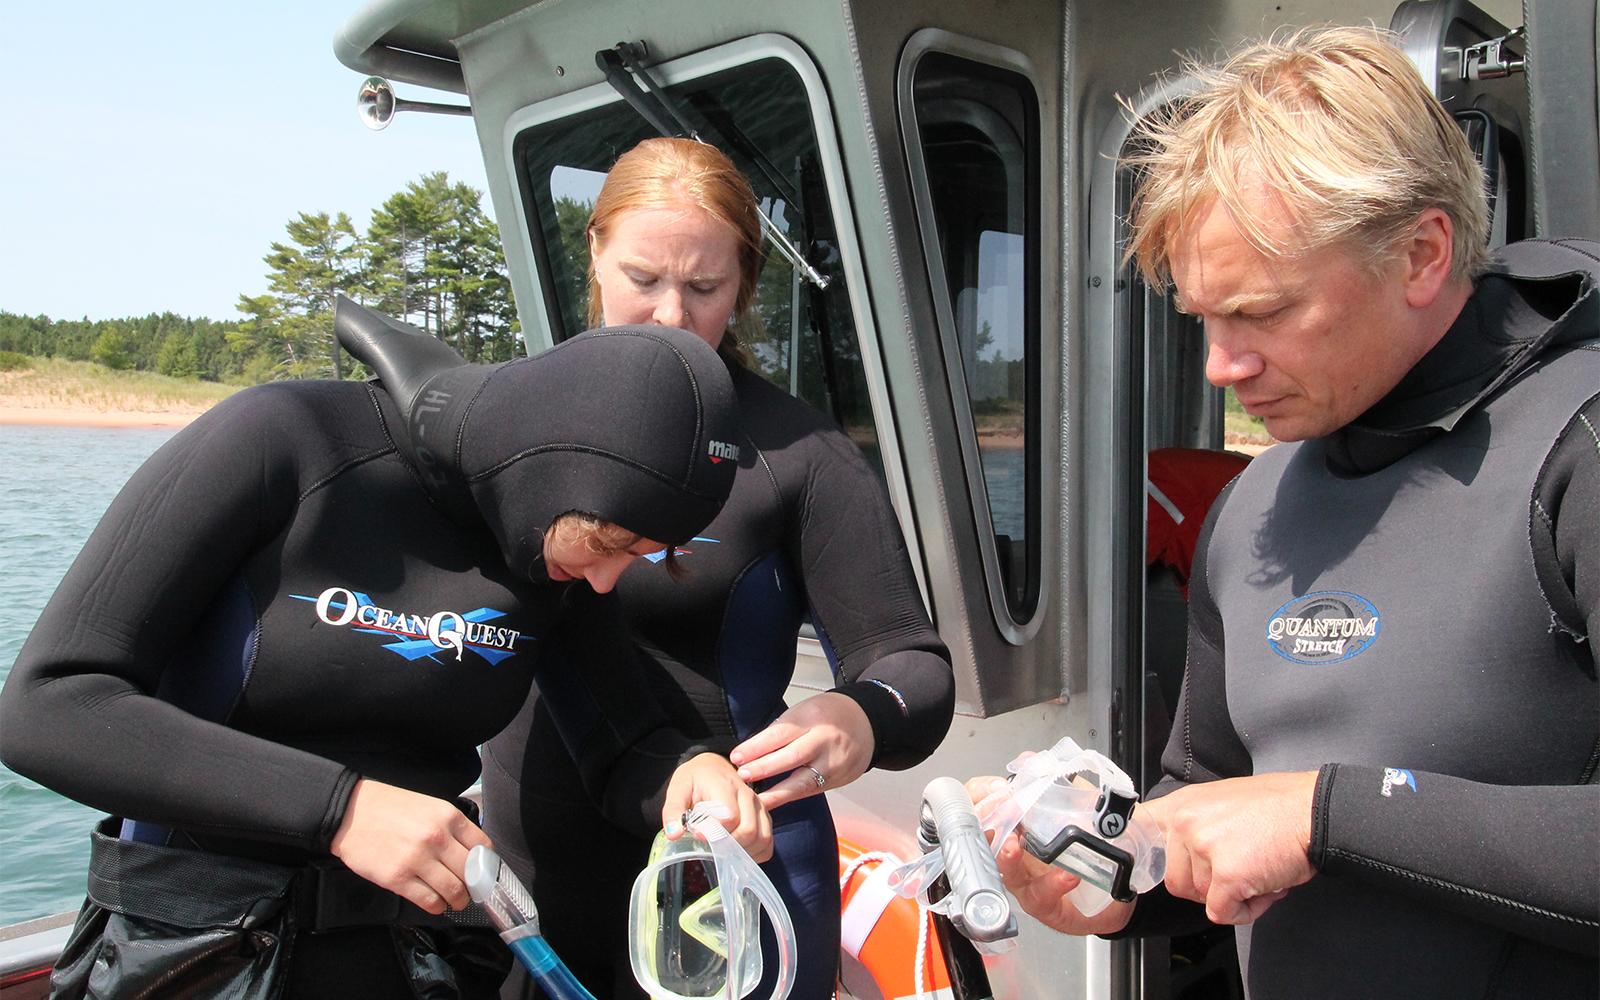 Scuba divers on boat